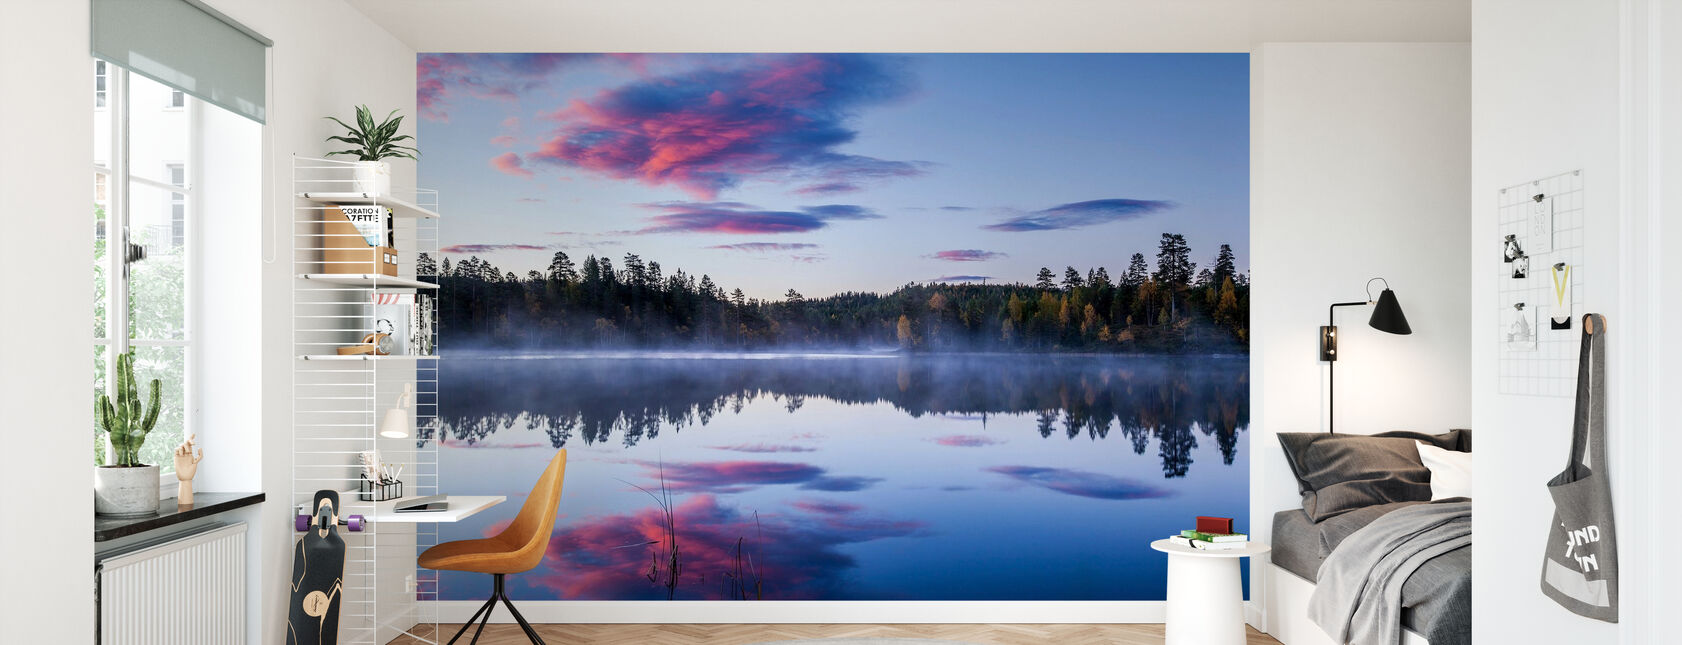 Norsk Morning - Tapet - Barnerom